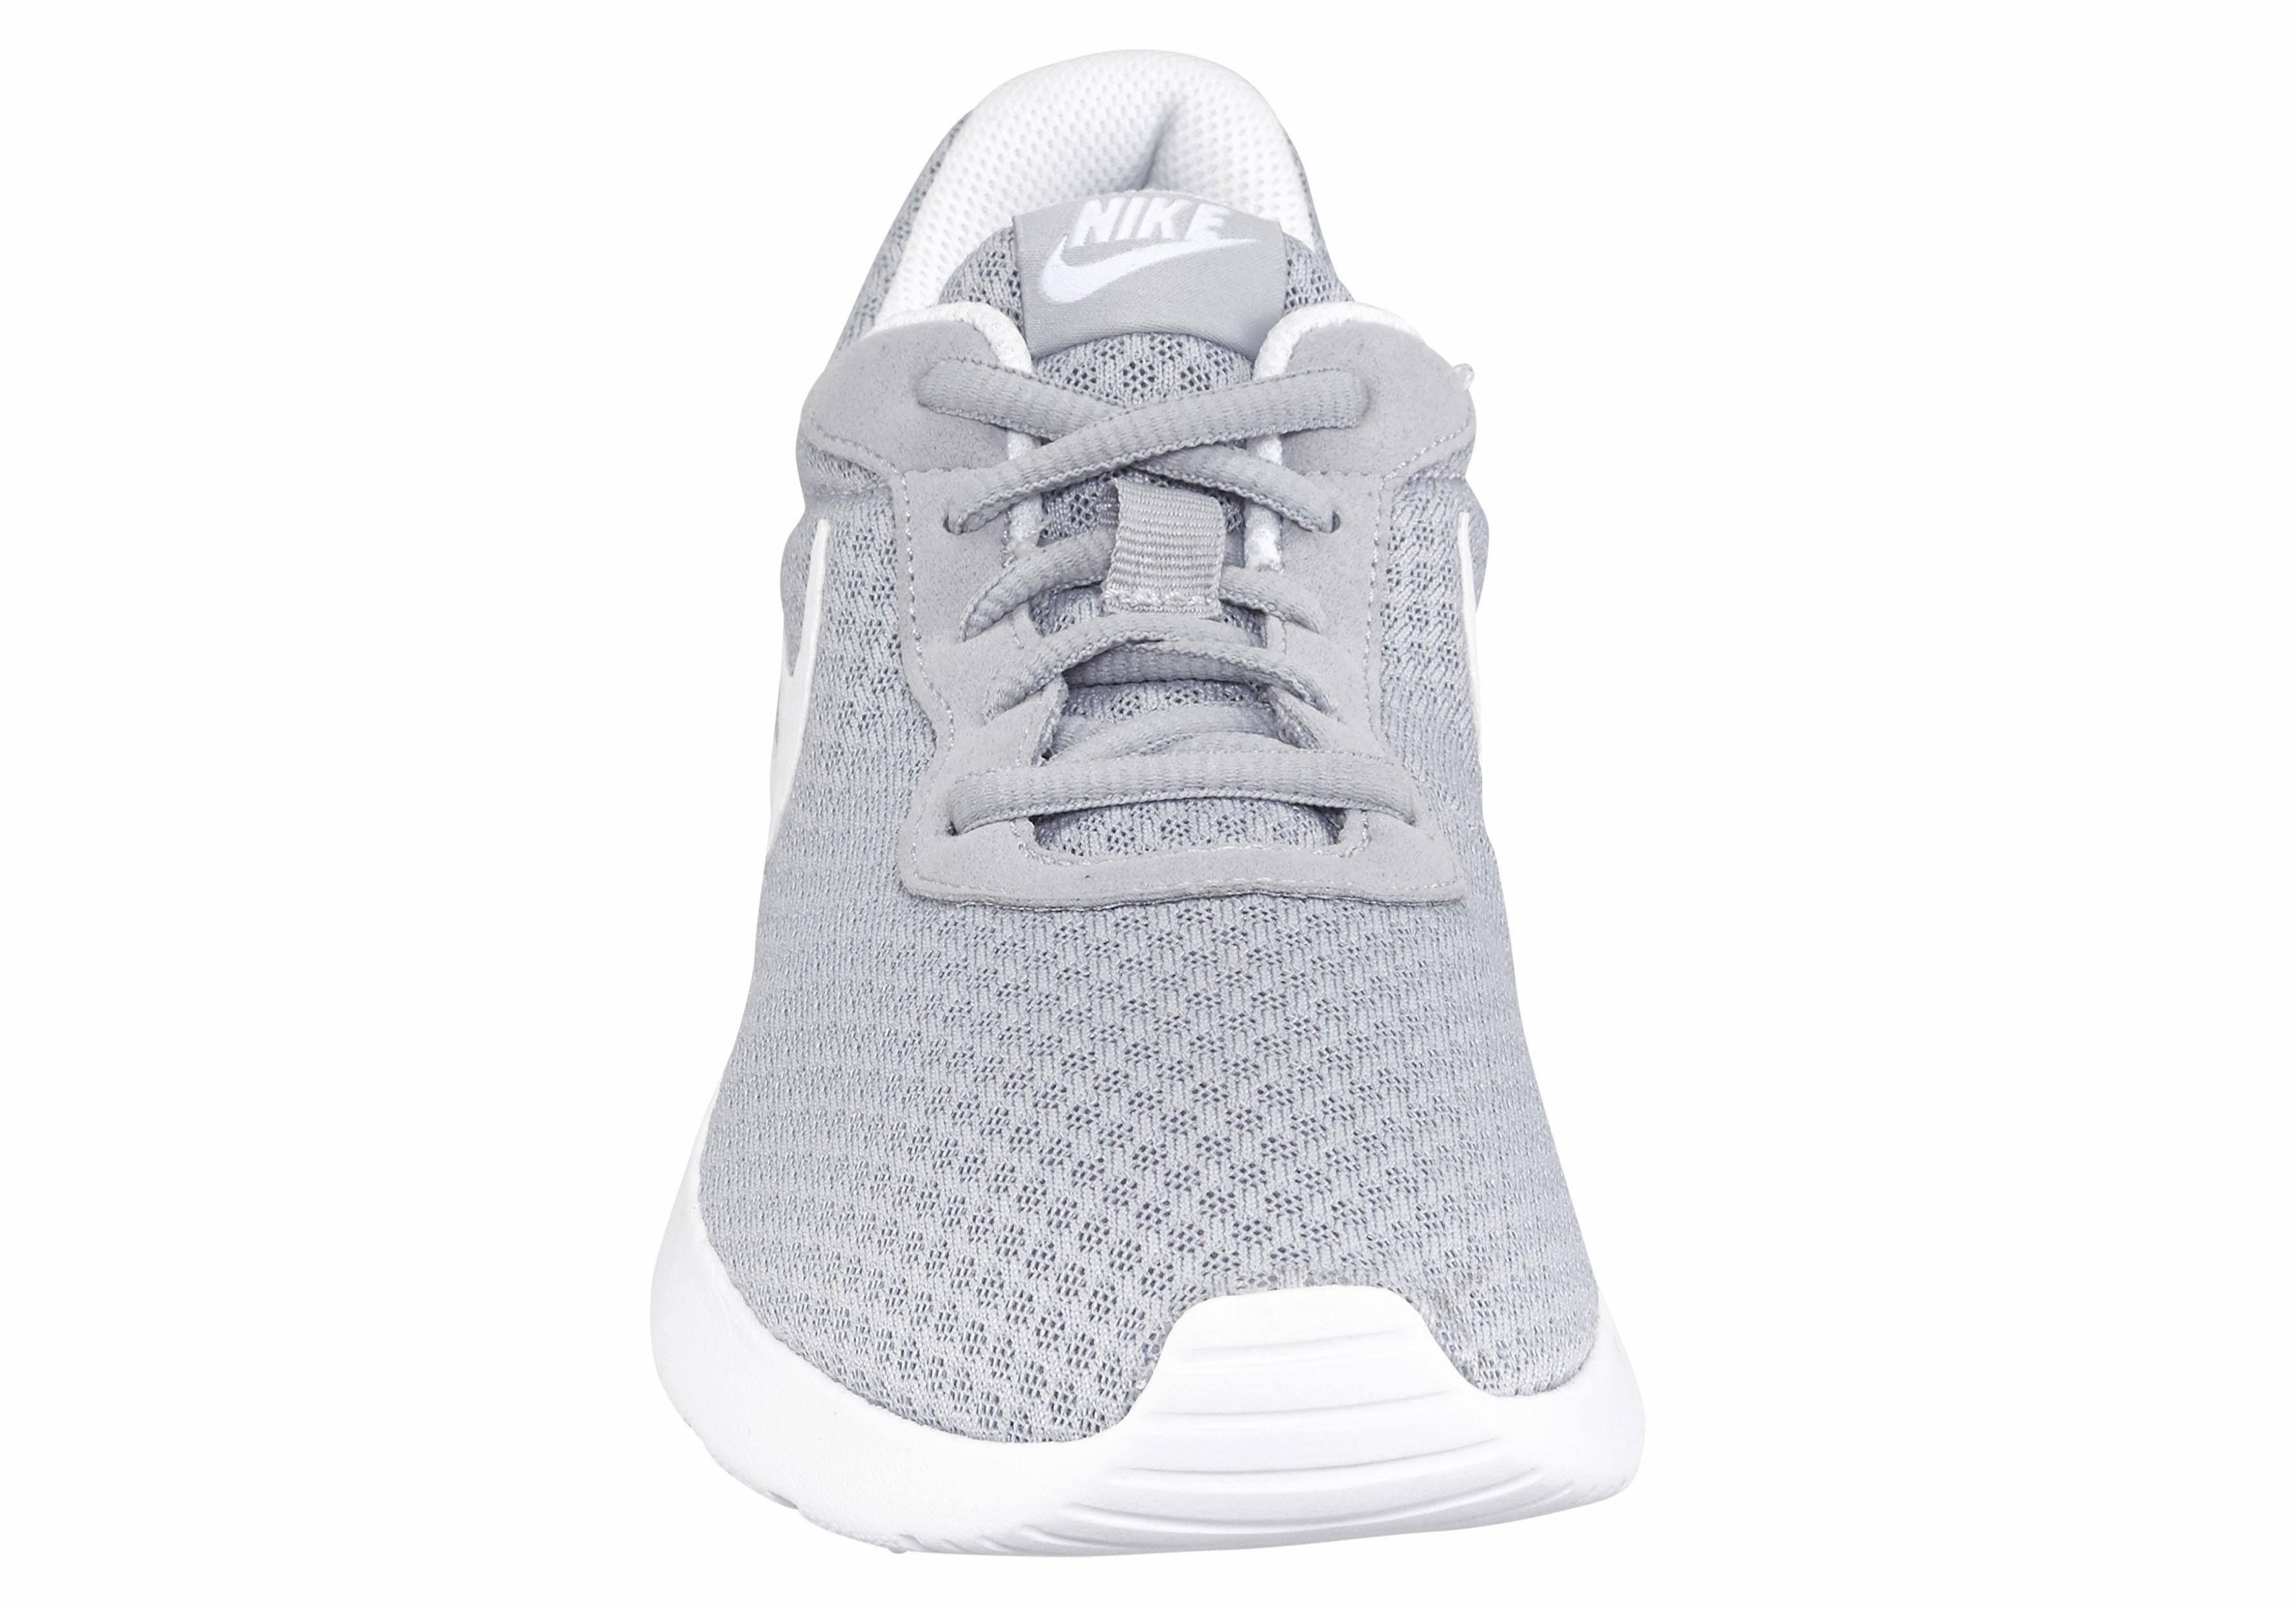 Tanjun Größenauswahl Grau 38 Nike Grau Wmns weiß 010 Damen Sneaker 812655 0qq5xwIF